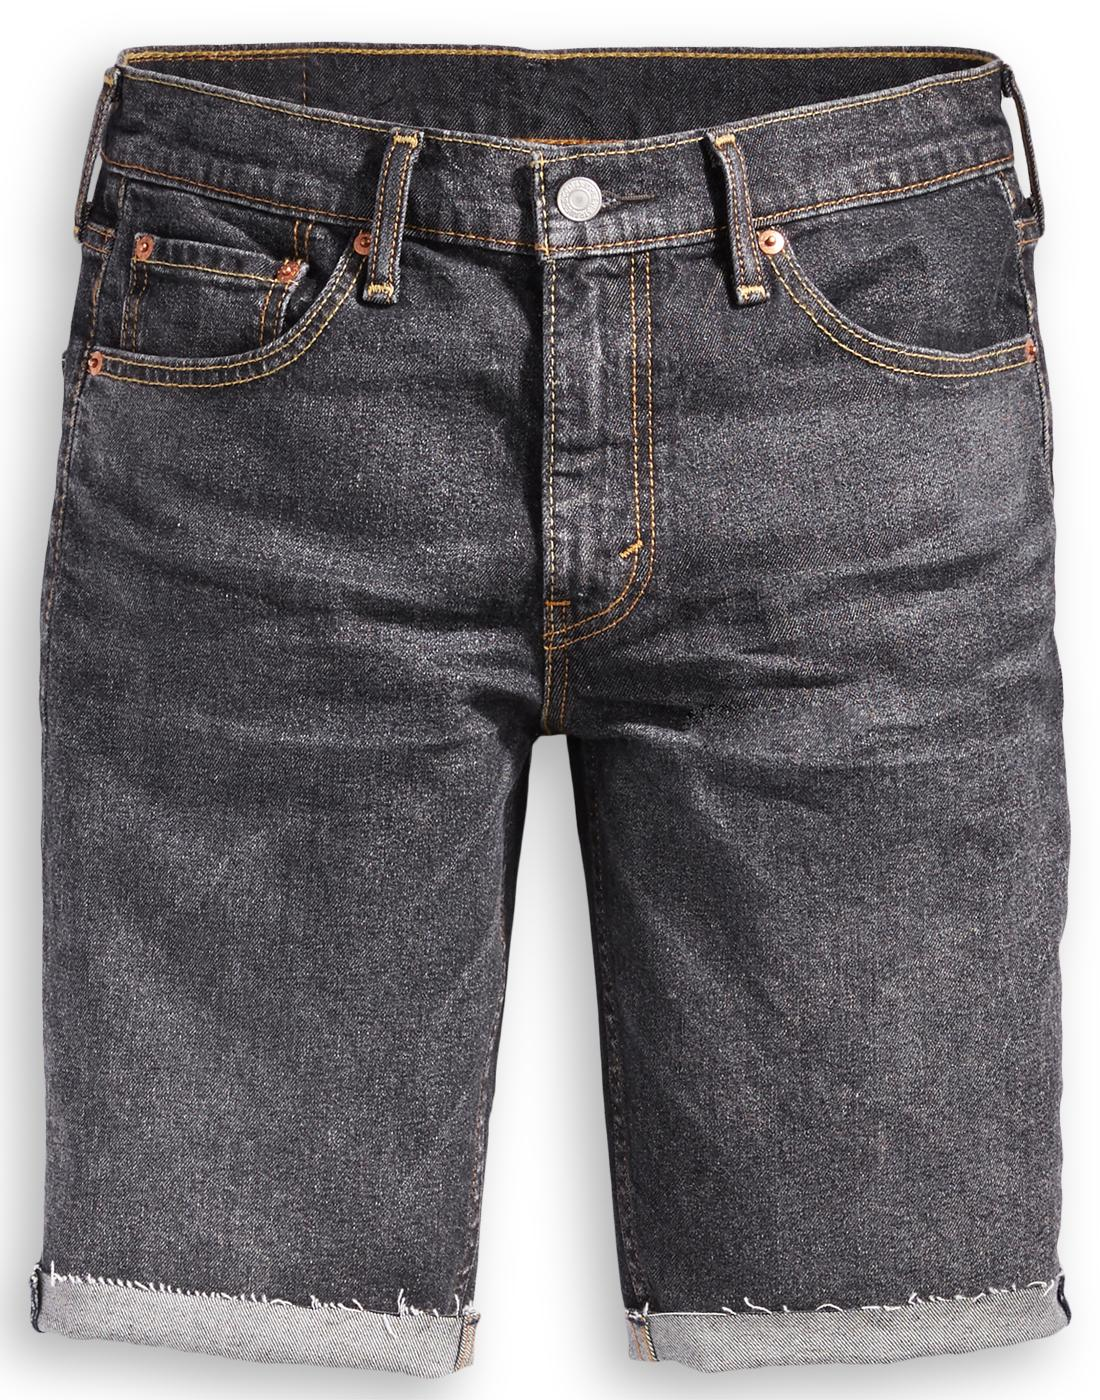 LEVI'S® 511 Retro Slim Cut Off Denim Shorts BLOKE